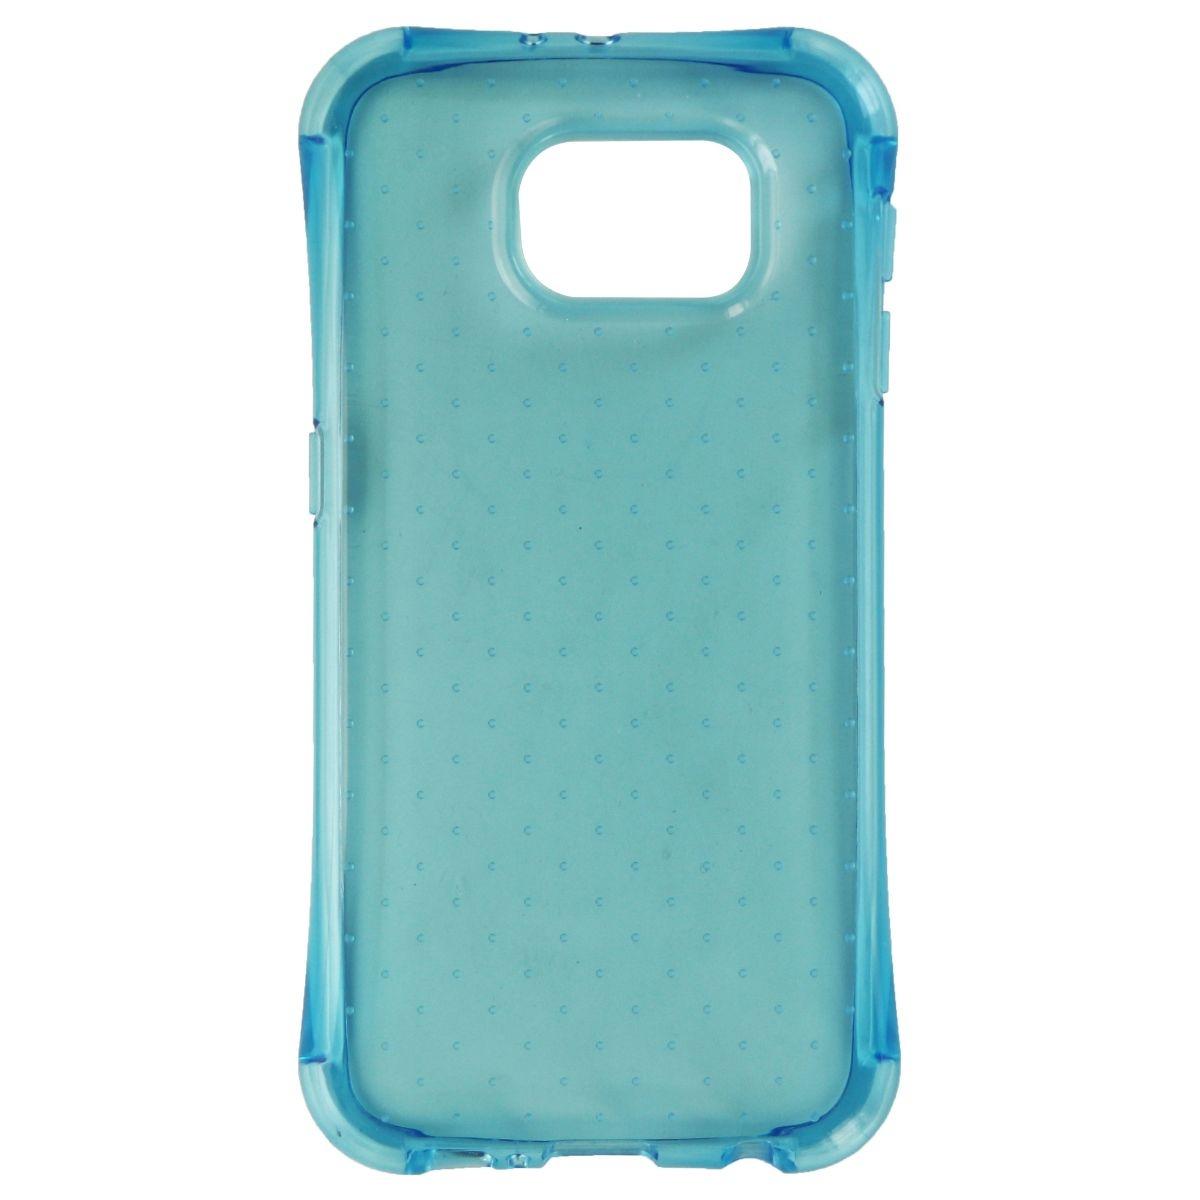 Nimbus9 Bumbler Air Series Gel case for Samsung Galaxy S6 - Blue / Translucent